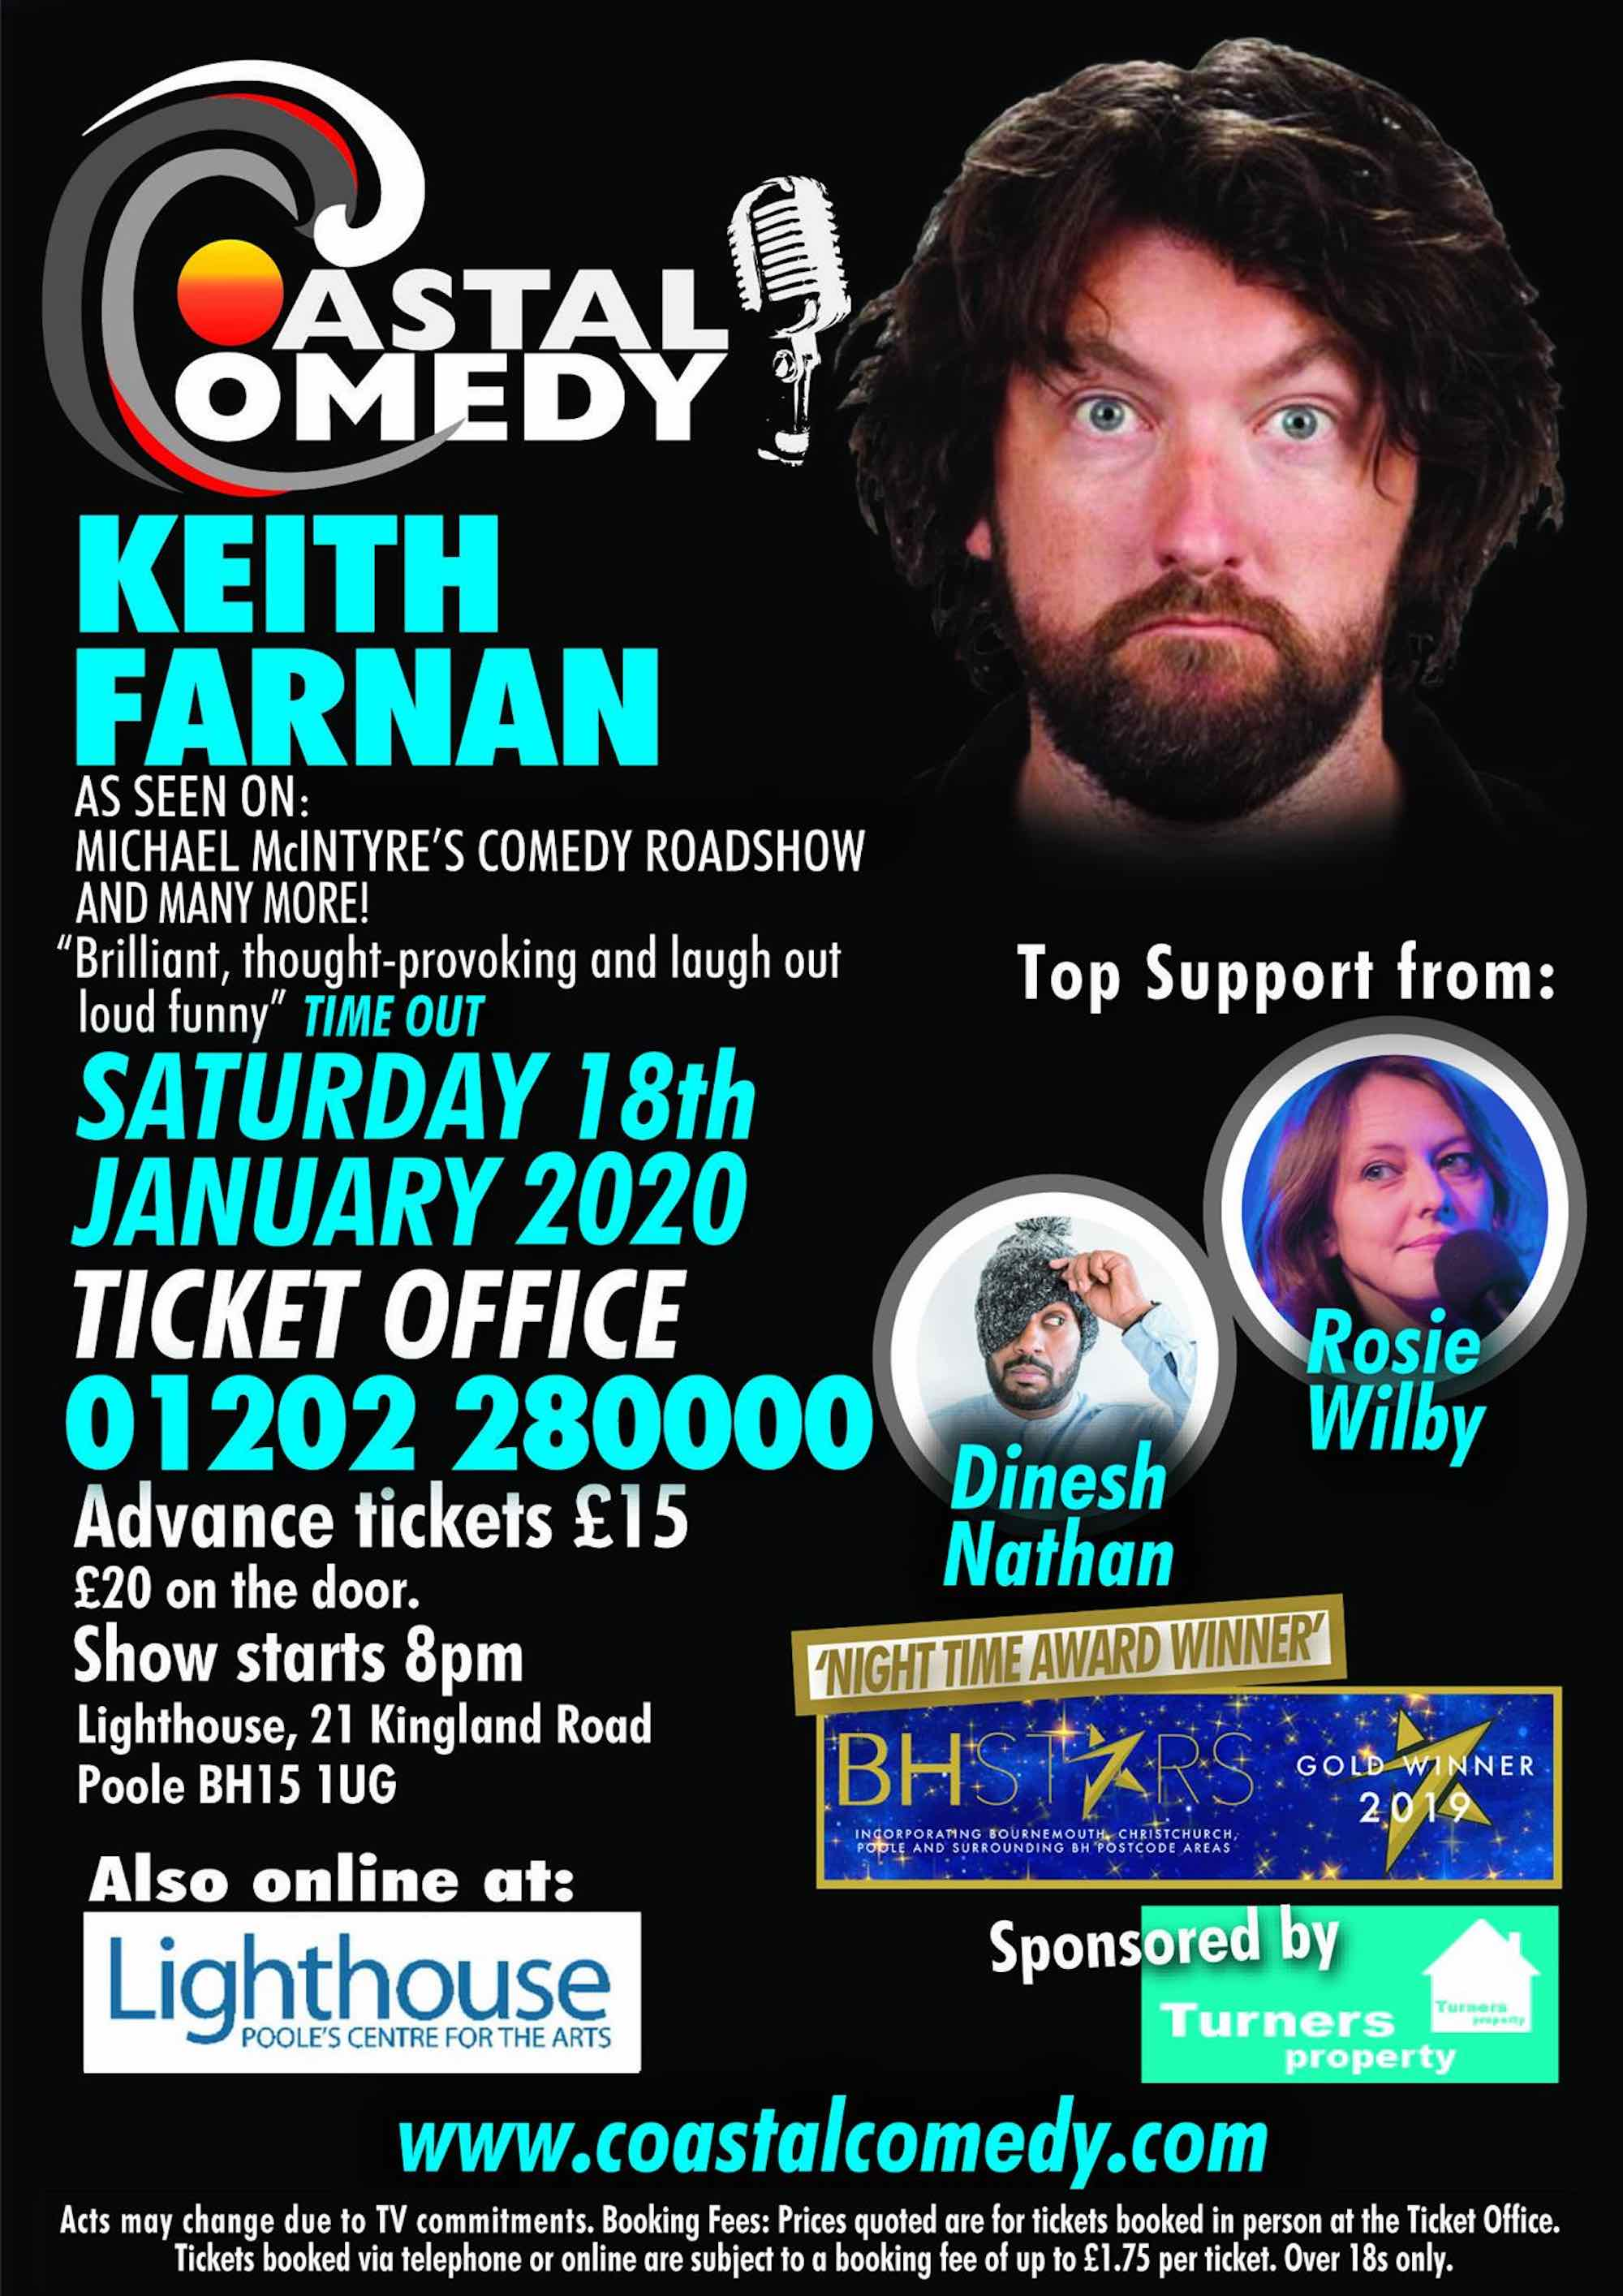 Poster of Coastal Comedy